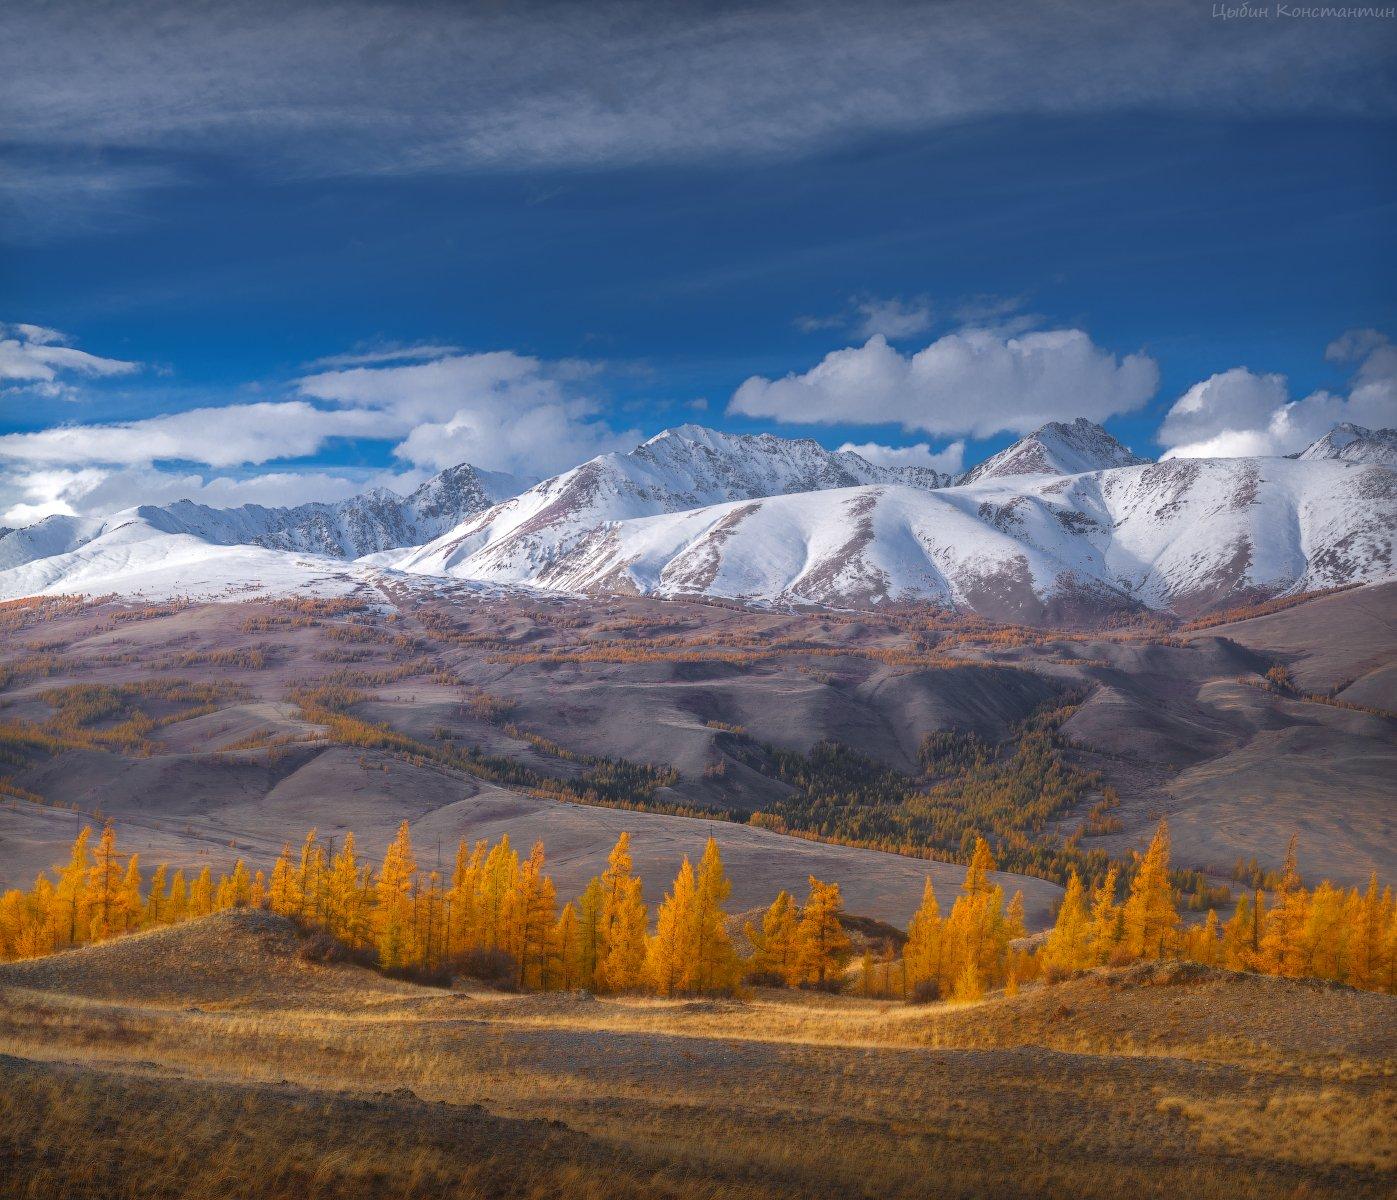 алтай, курай, курайский хребет, чуя, чуйский тракт, горы, осень, Цыбин Константин